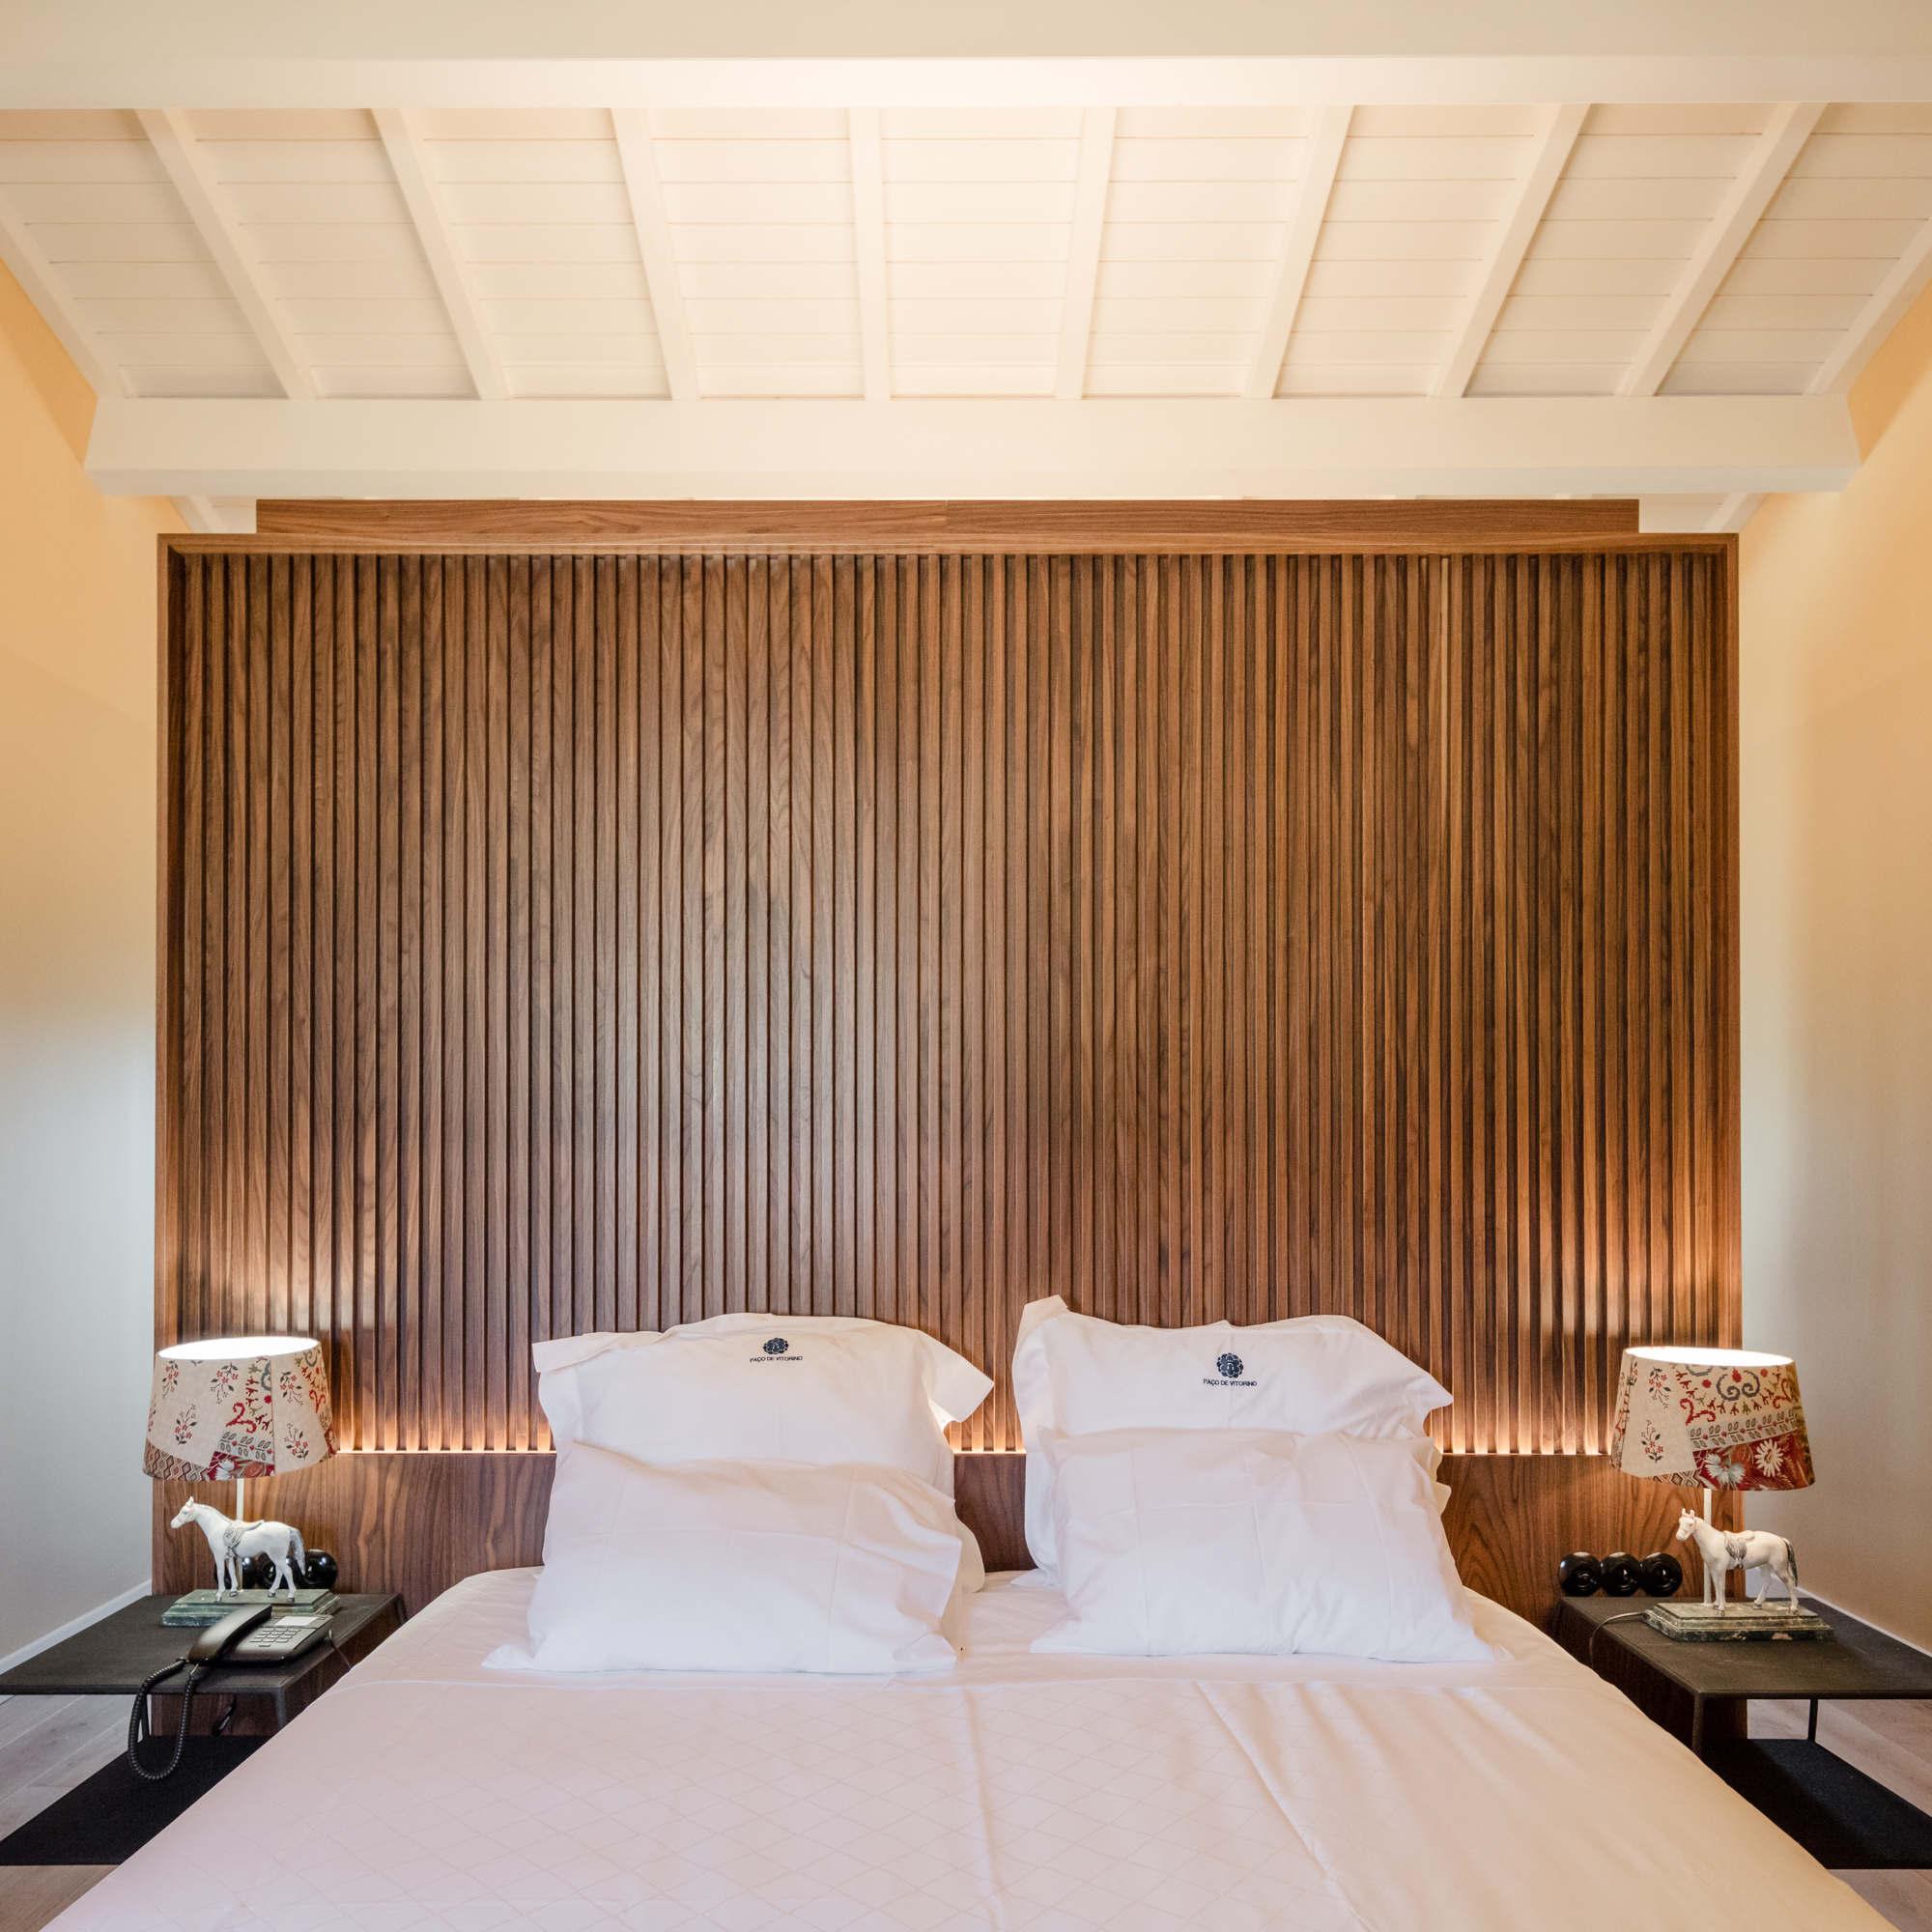 PROD - Paço Vitorino Hotel - BR14.jpg